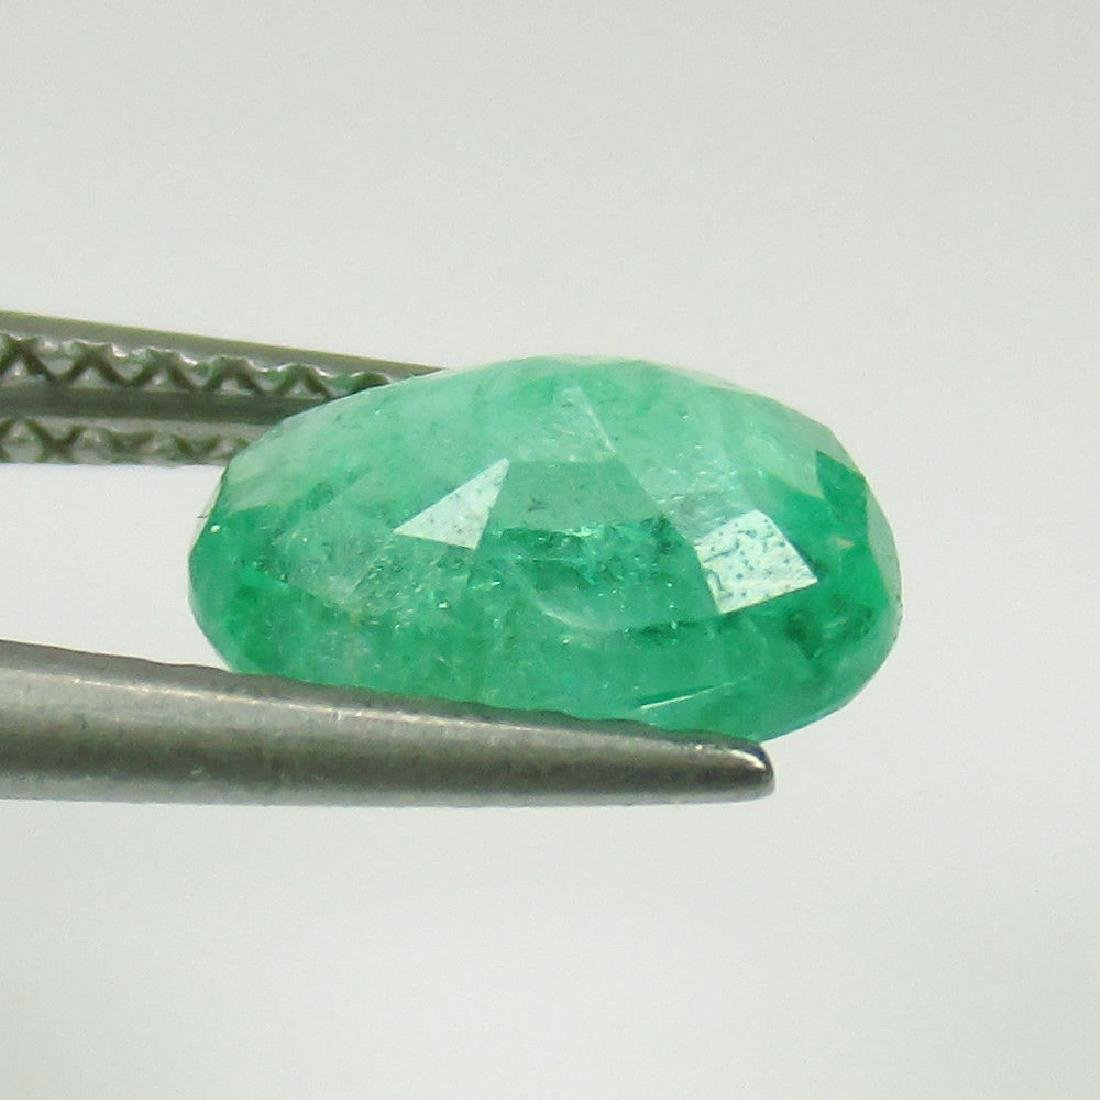 1.35 Ctw Natural Zambian Loose Oval cut Emerald - 3